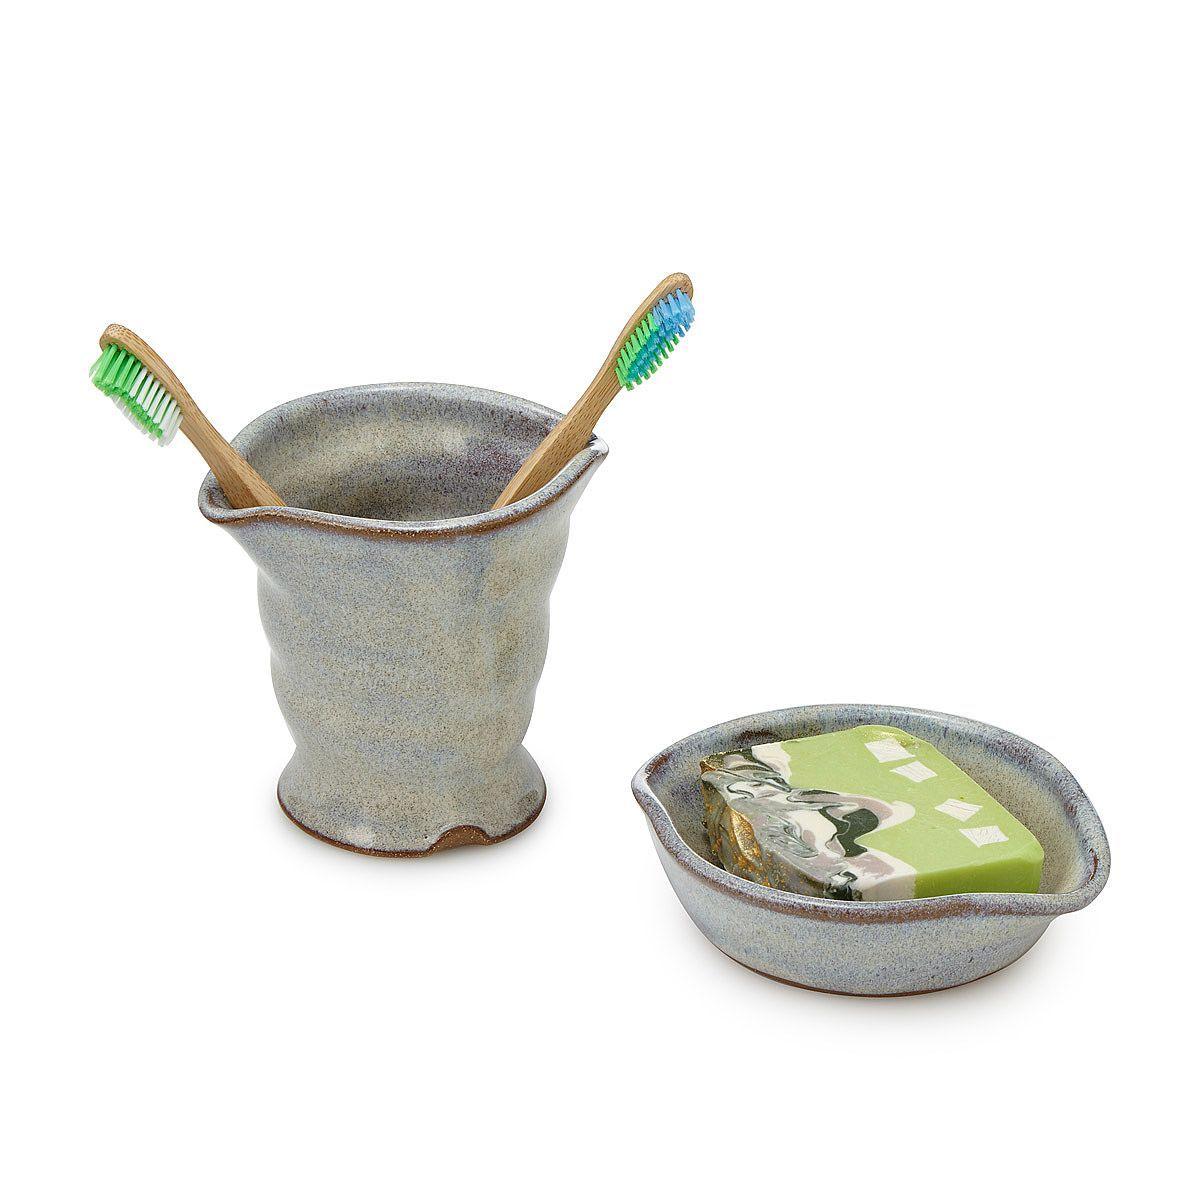 Stoneware Bath Decor Toothbrush Holder Soap Dish Bath Decor Pottery Mugs Stoneware